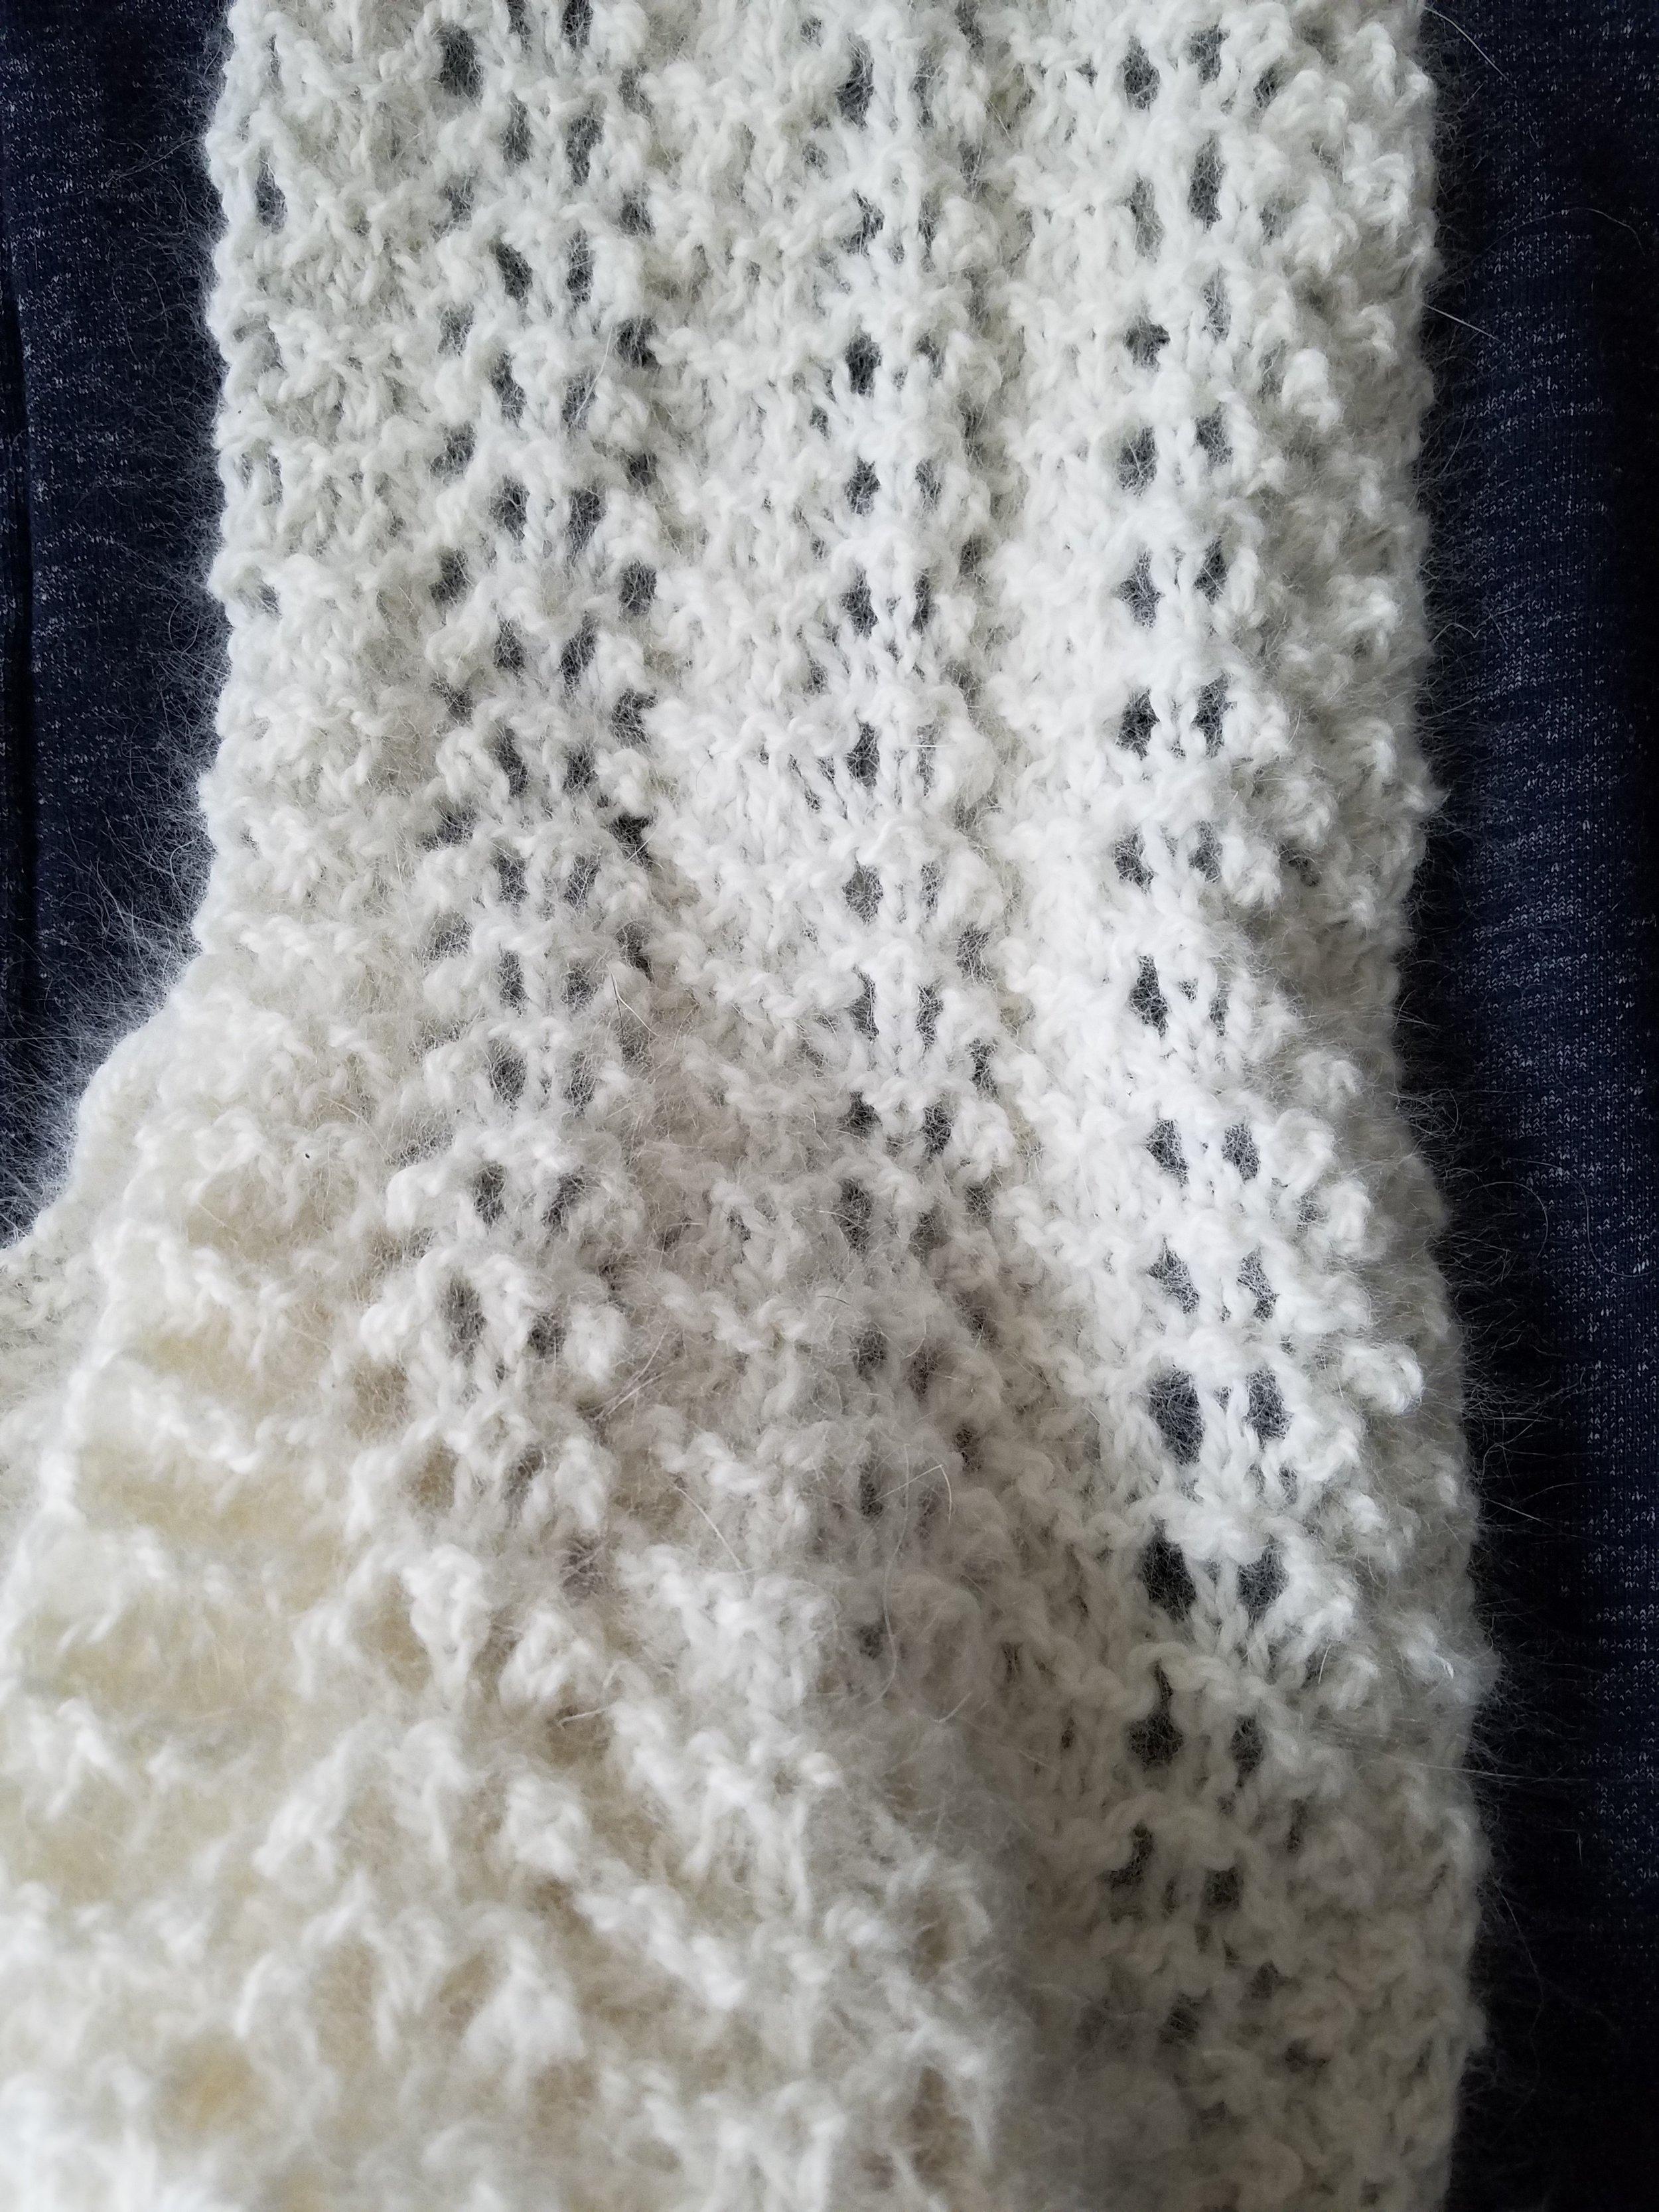 - HAND-KNIT SCARF - made using The Rosefield 50% angora/50% merino yarn